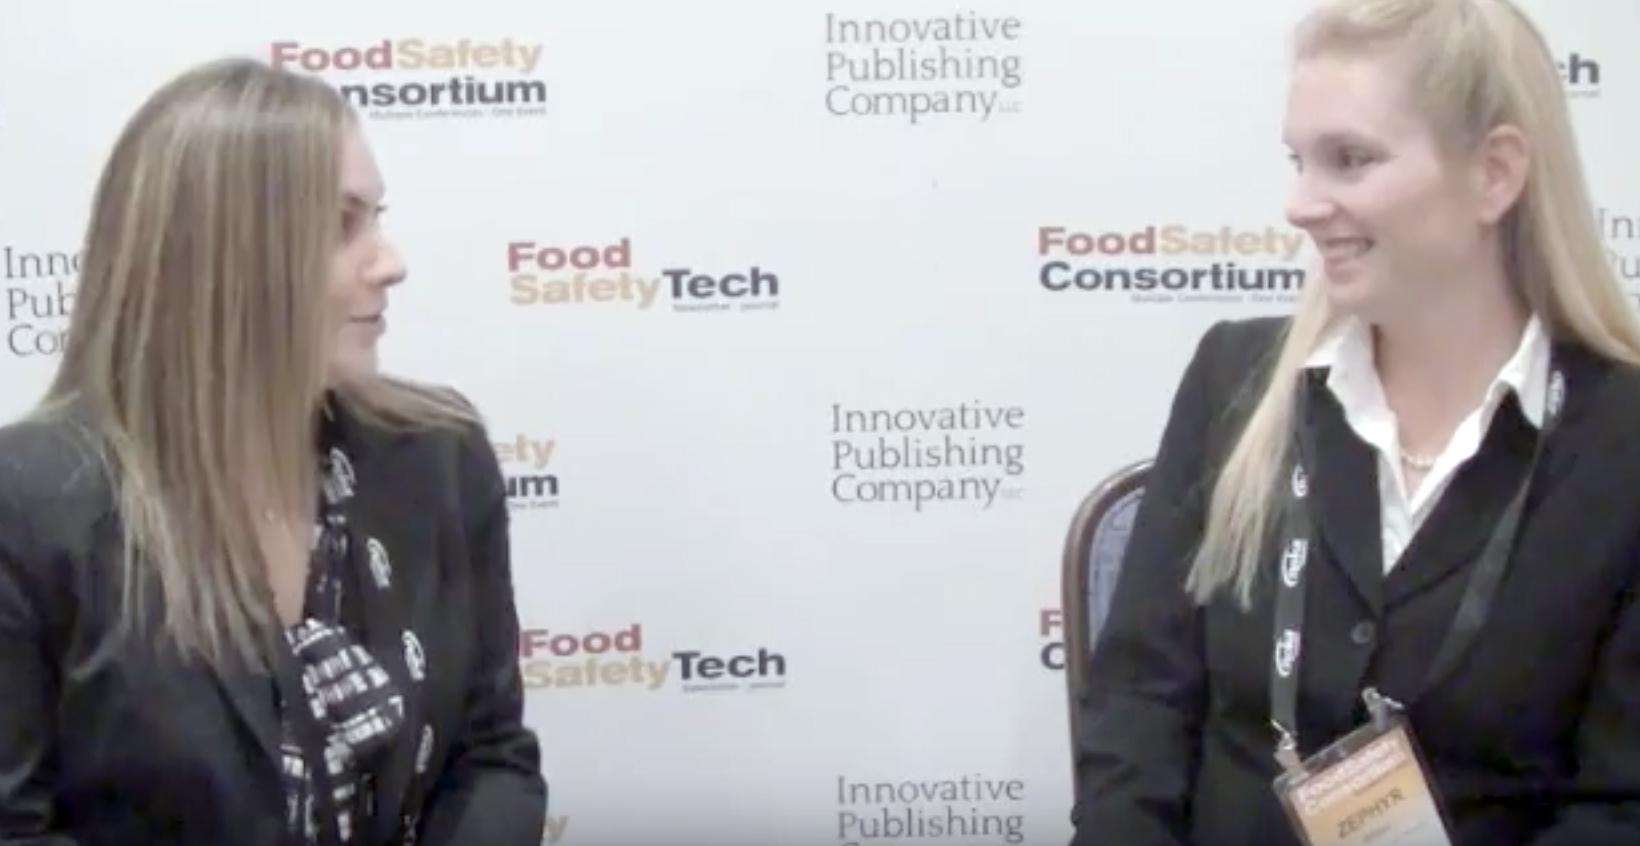 Maria Fontanazza, Zephyr Wilson, Food Safety Consortium